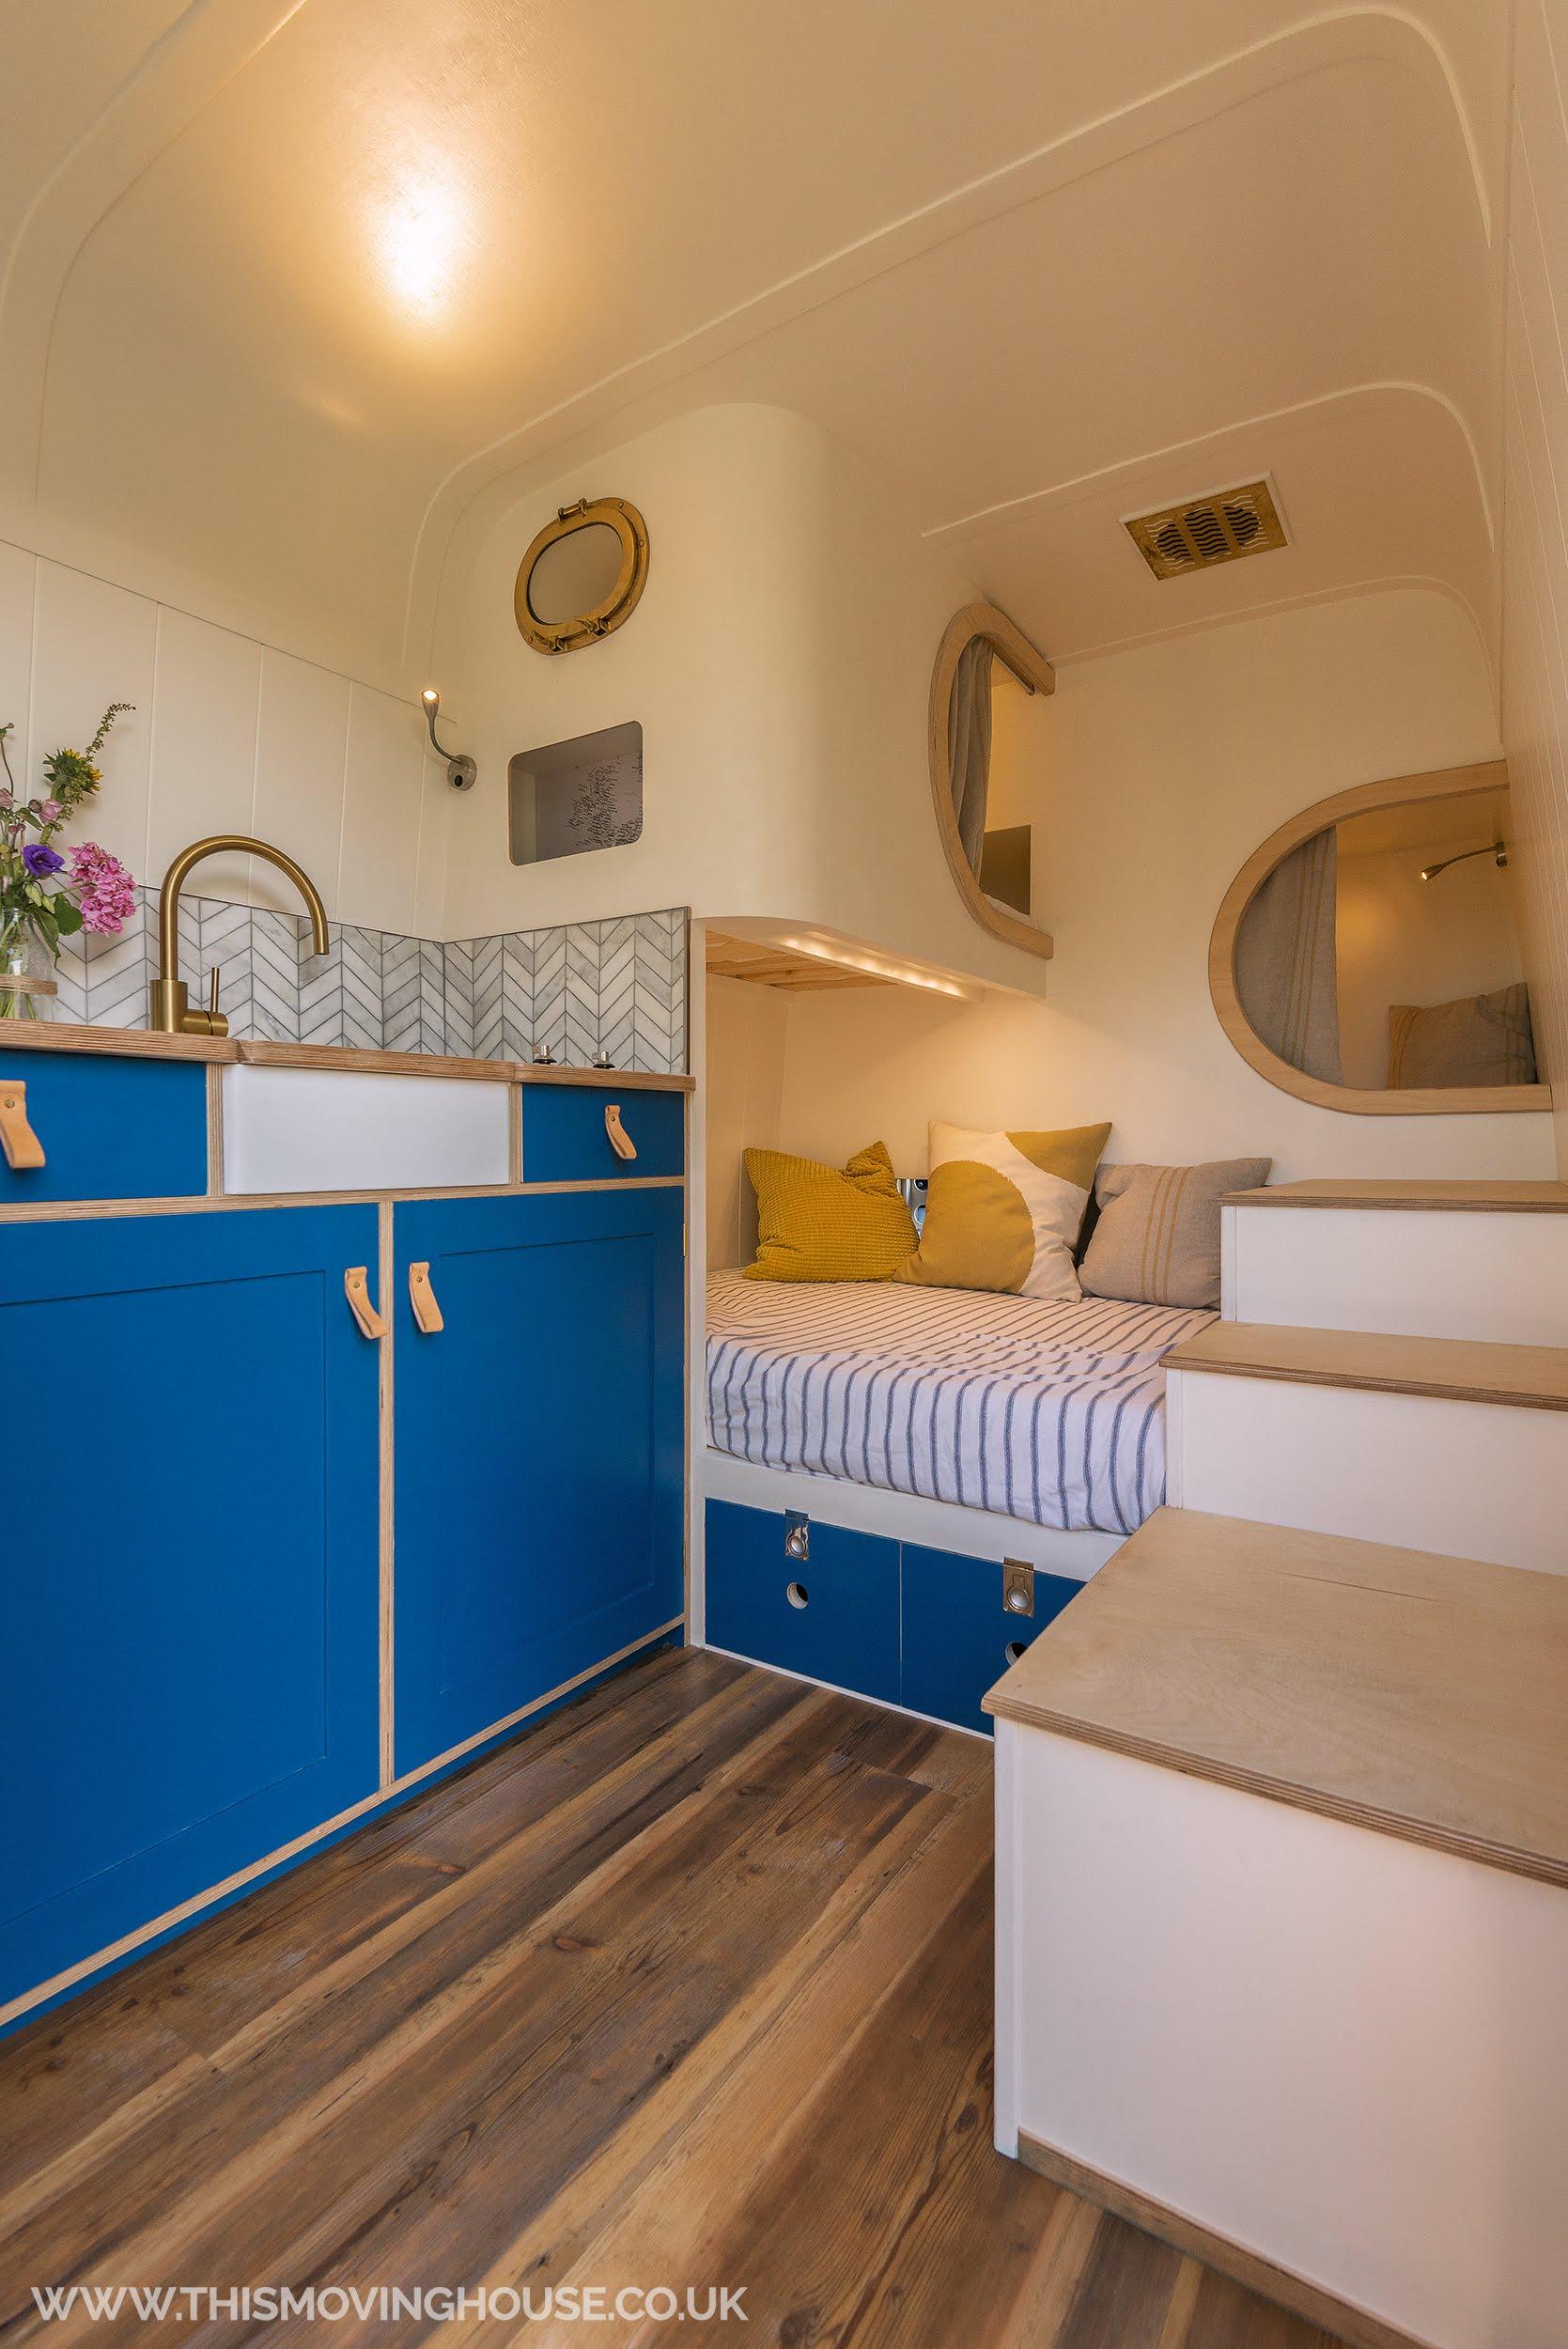 bespoke camper van conversion with mini belfast sink